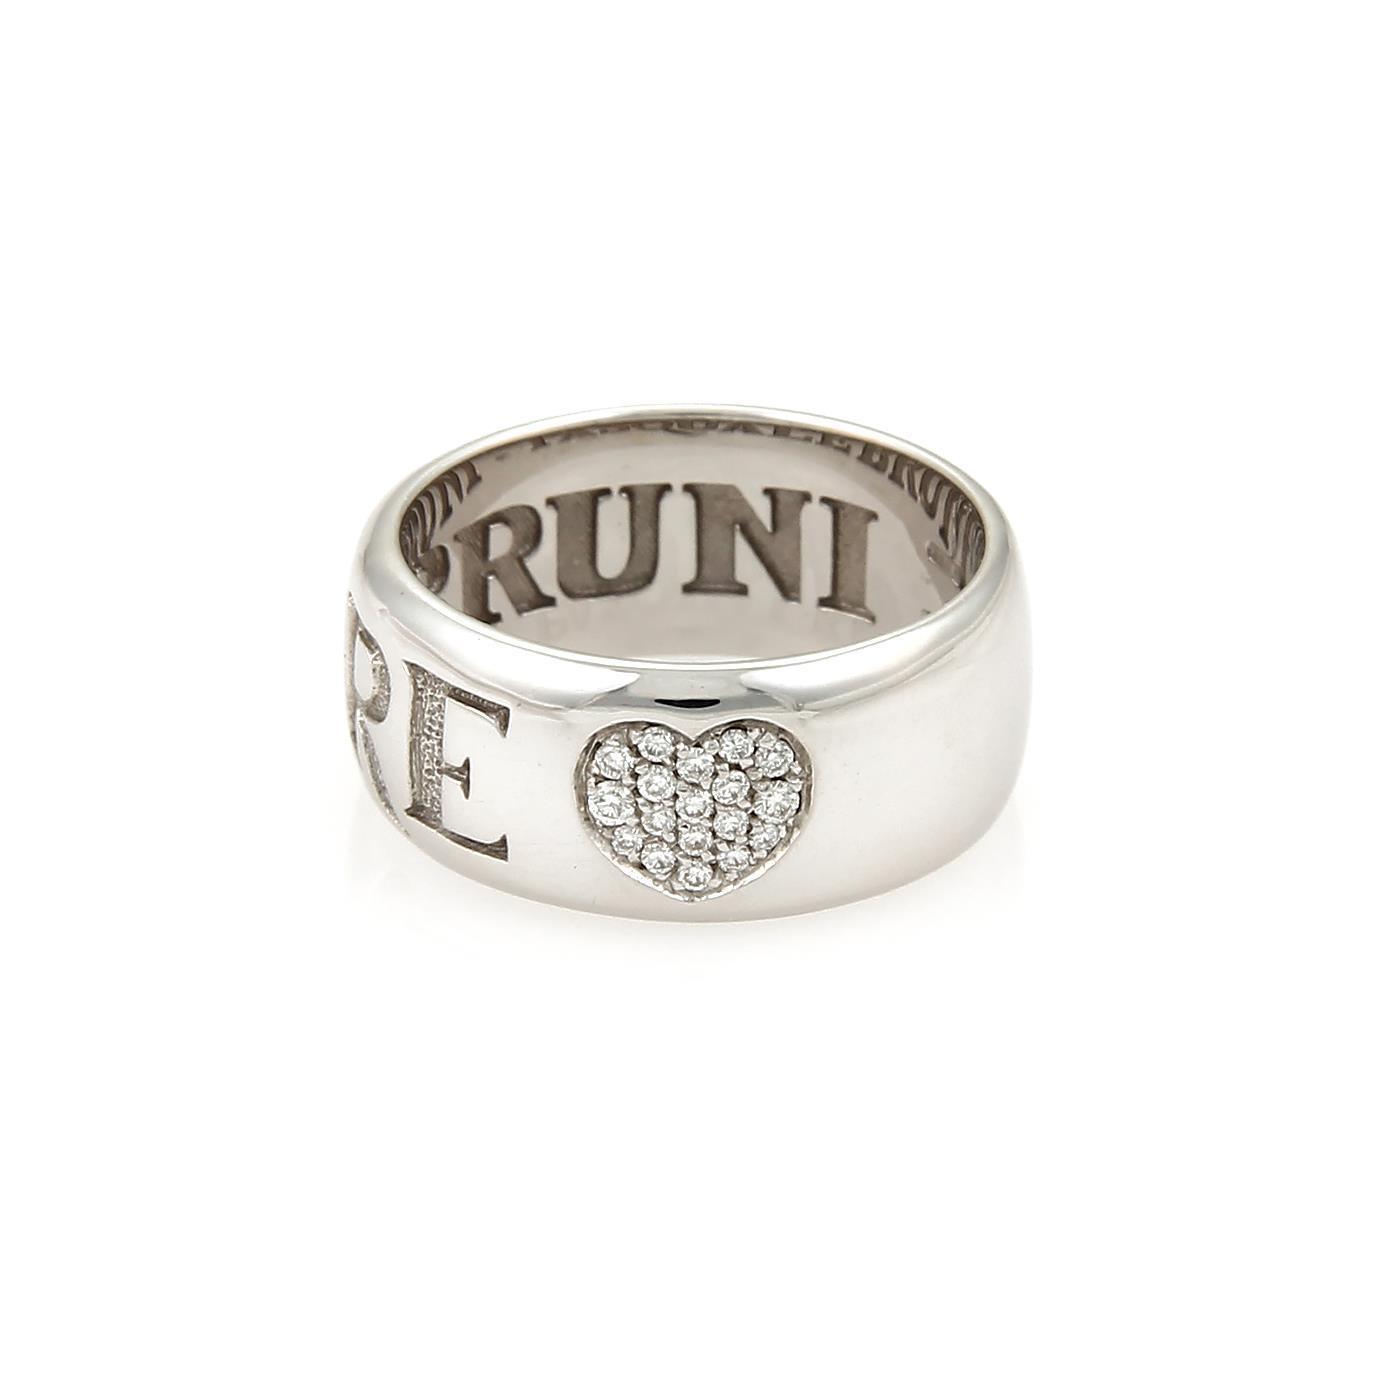 """""Pasquale Bruni Amore 18K White Gold & Diamonds Band Ring Size 7"""""" 1842355"